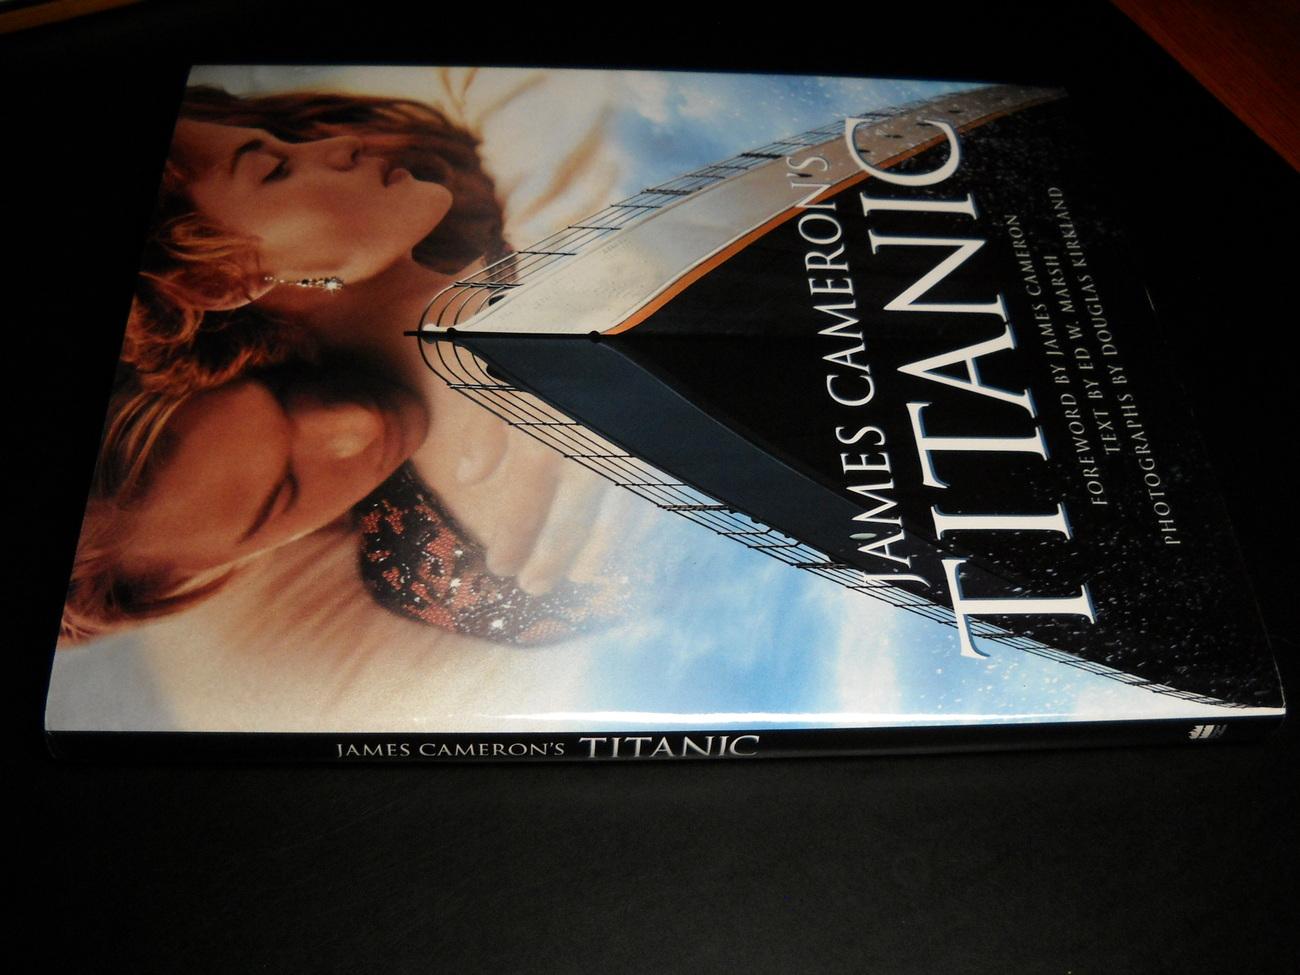 Book james cameron s titanic marsh kirkland harper collins 1997 hcdj 02